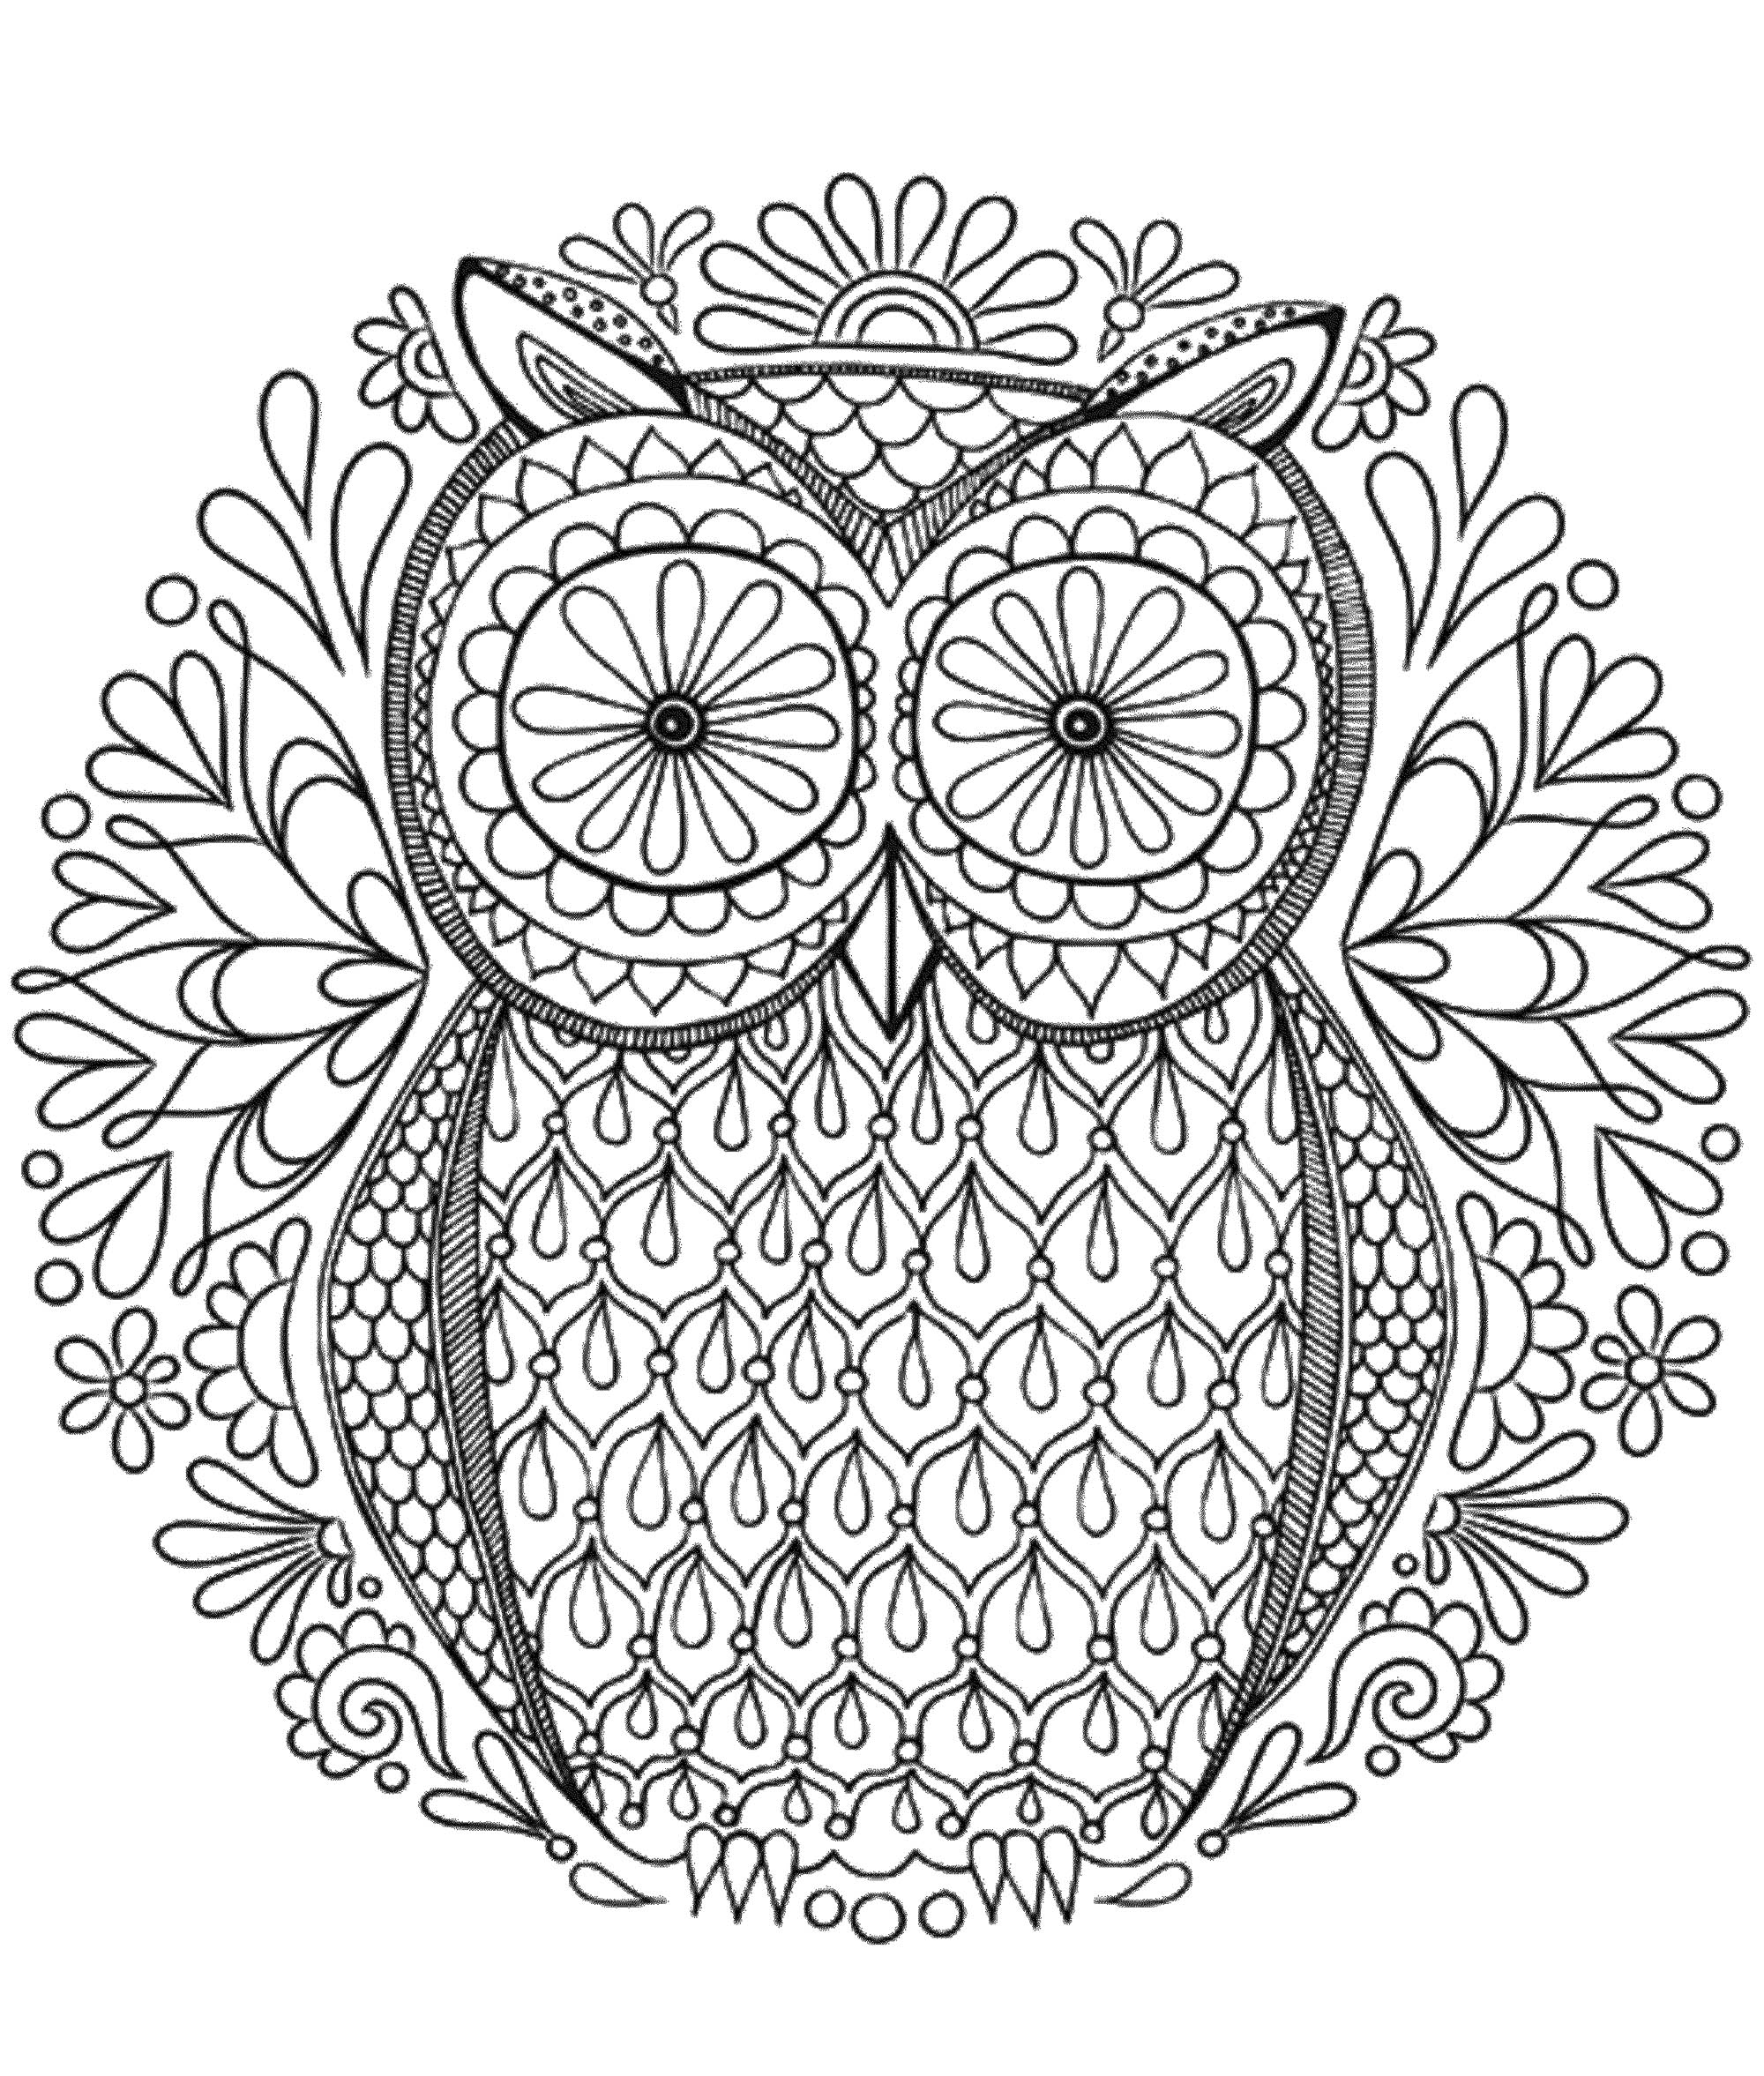 Mandala to download owl - Simple Mandalas - 100% Mandalas ...